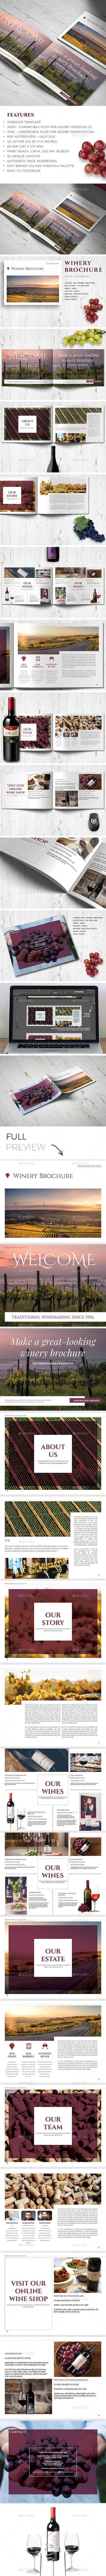 Vineyard & Winery Brochure - Informational Brochures